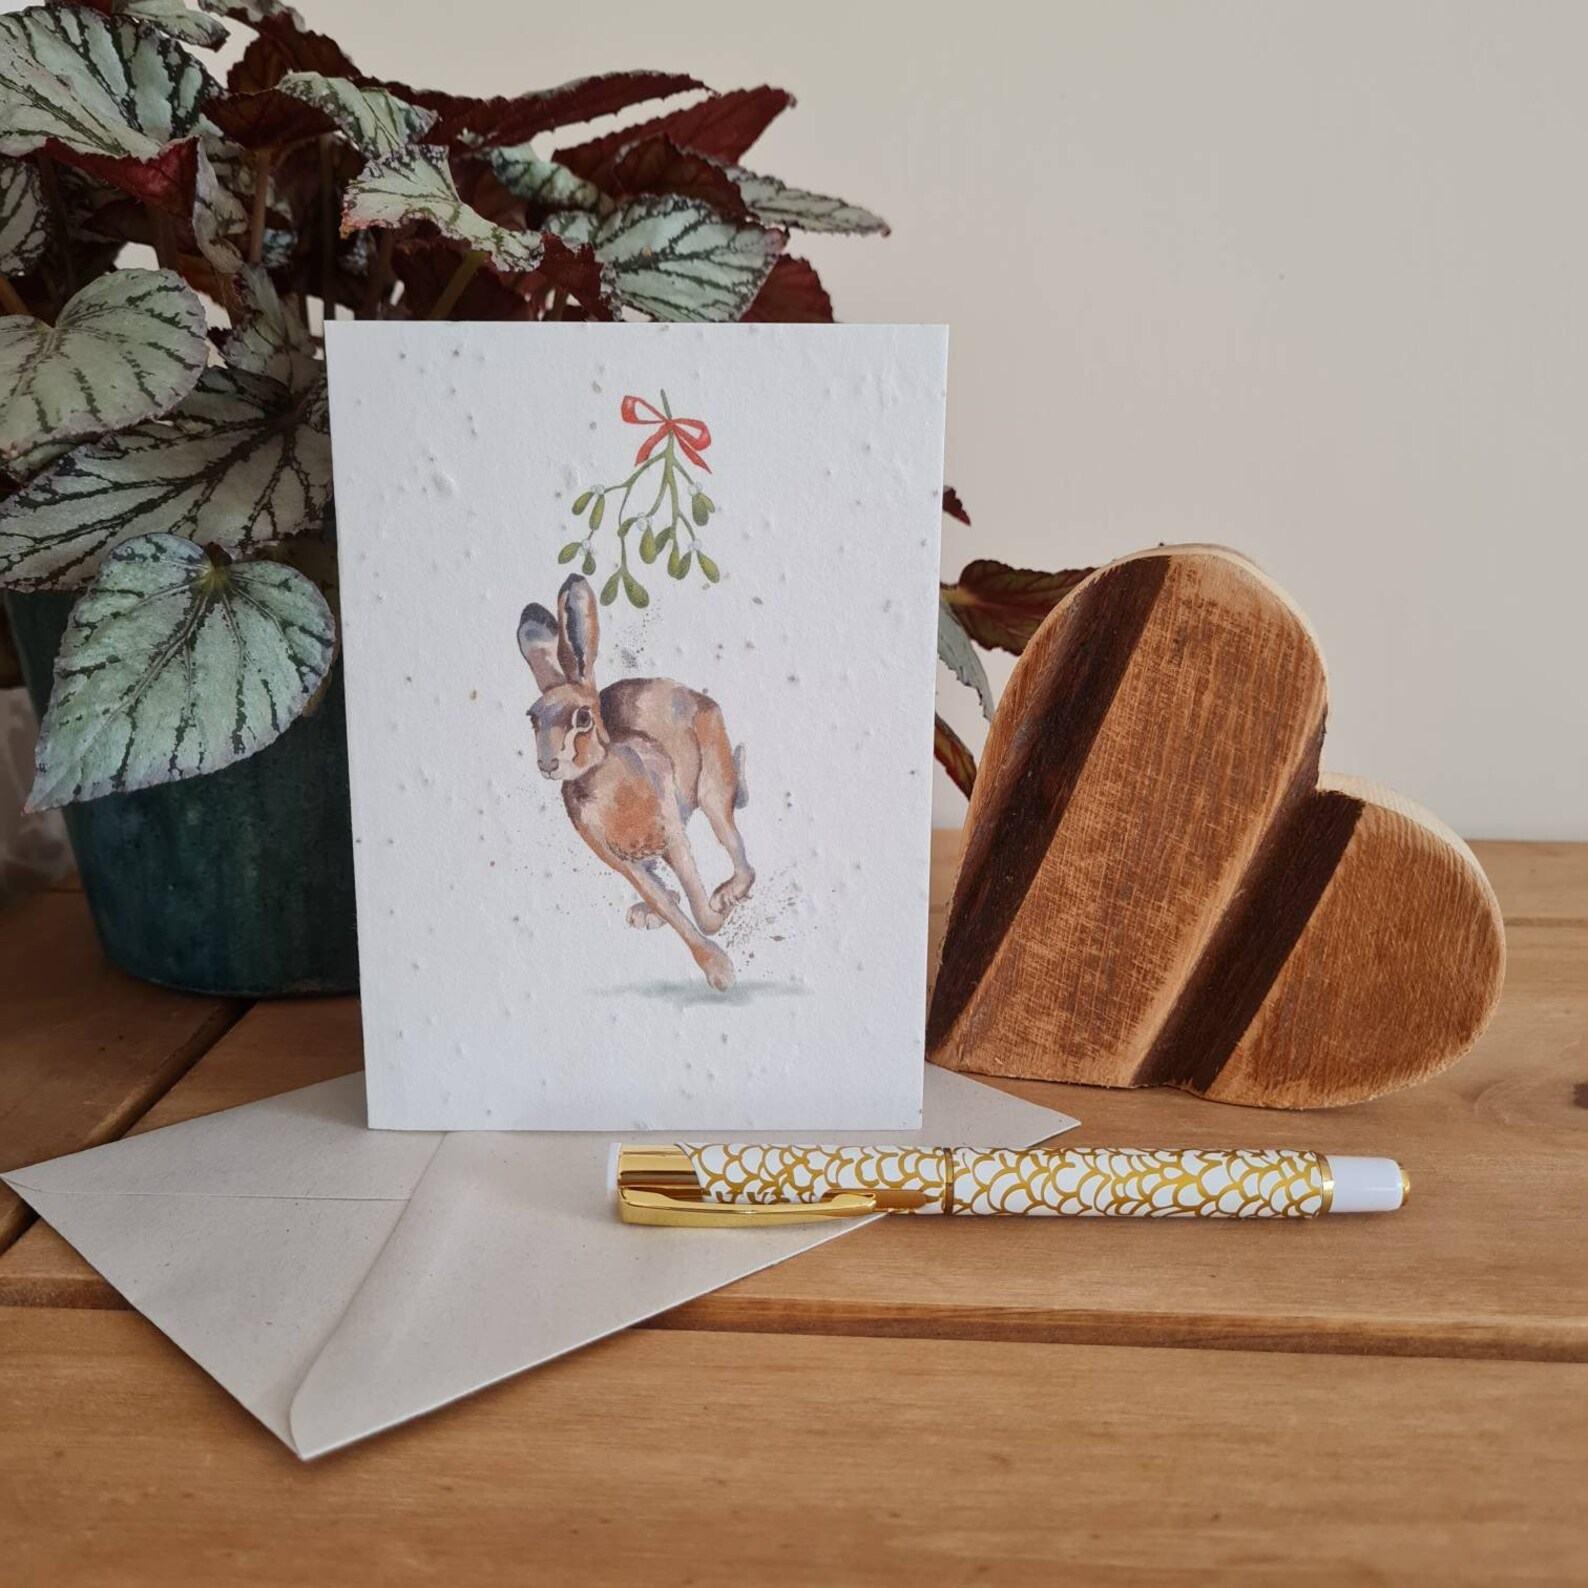 Plantable Wildflower Seed Christmas Card With Hare & Mistletoe